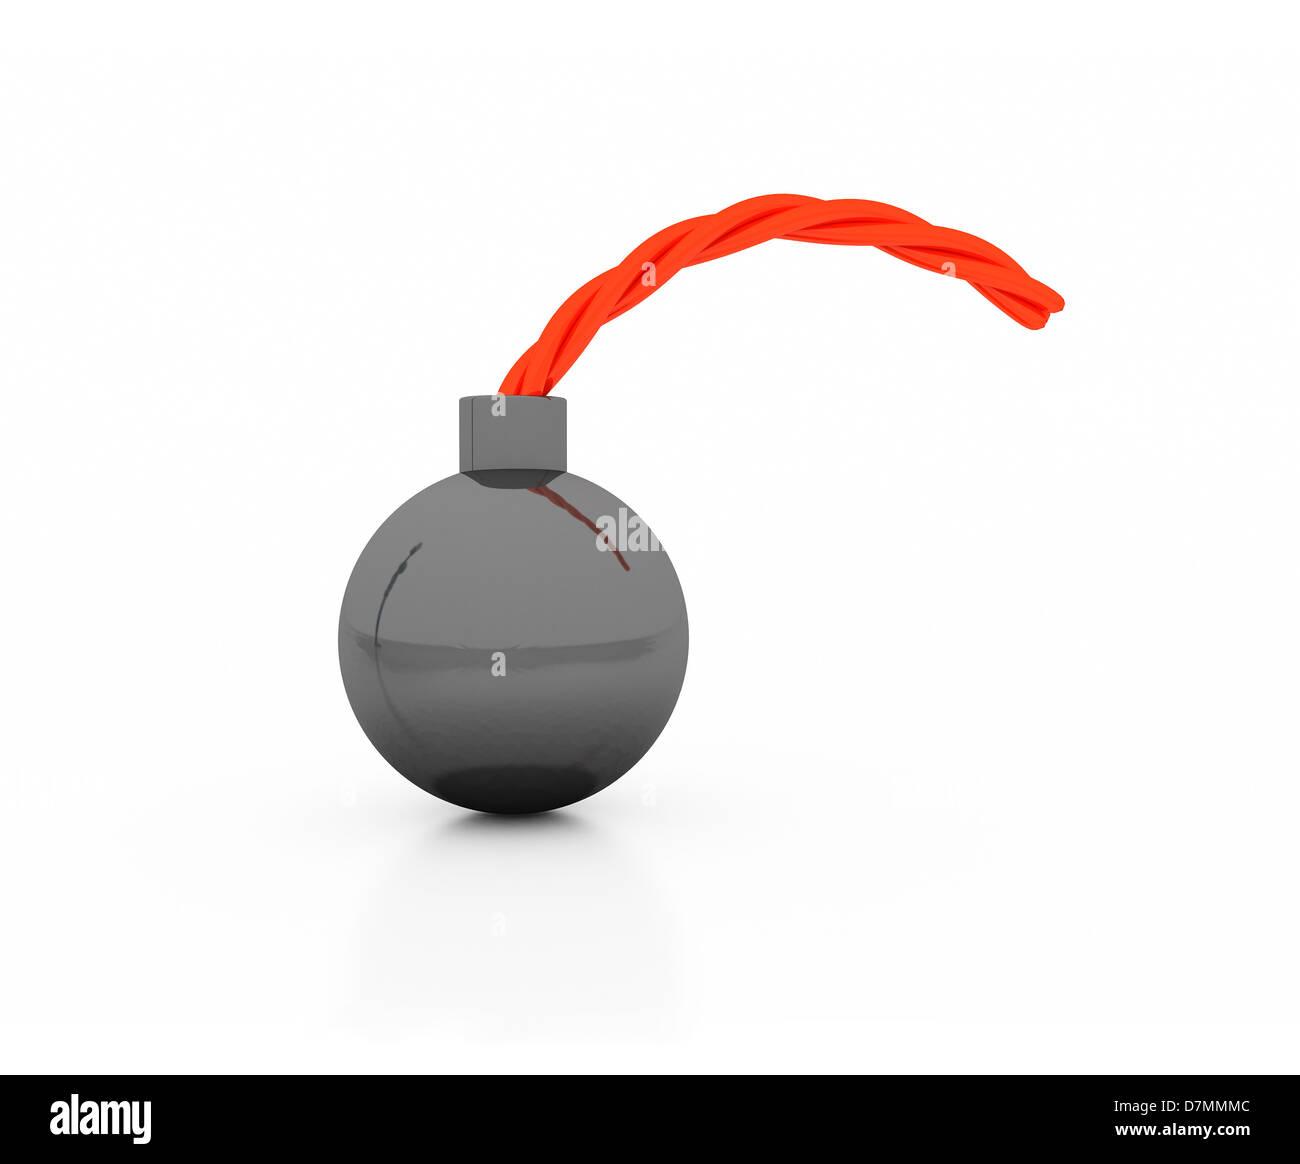 Bomb, artwork - Stock Image